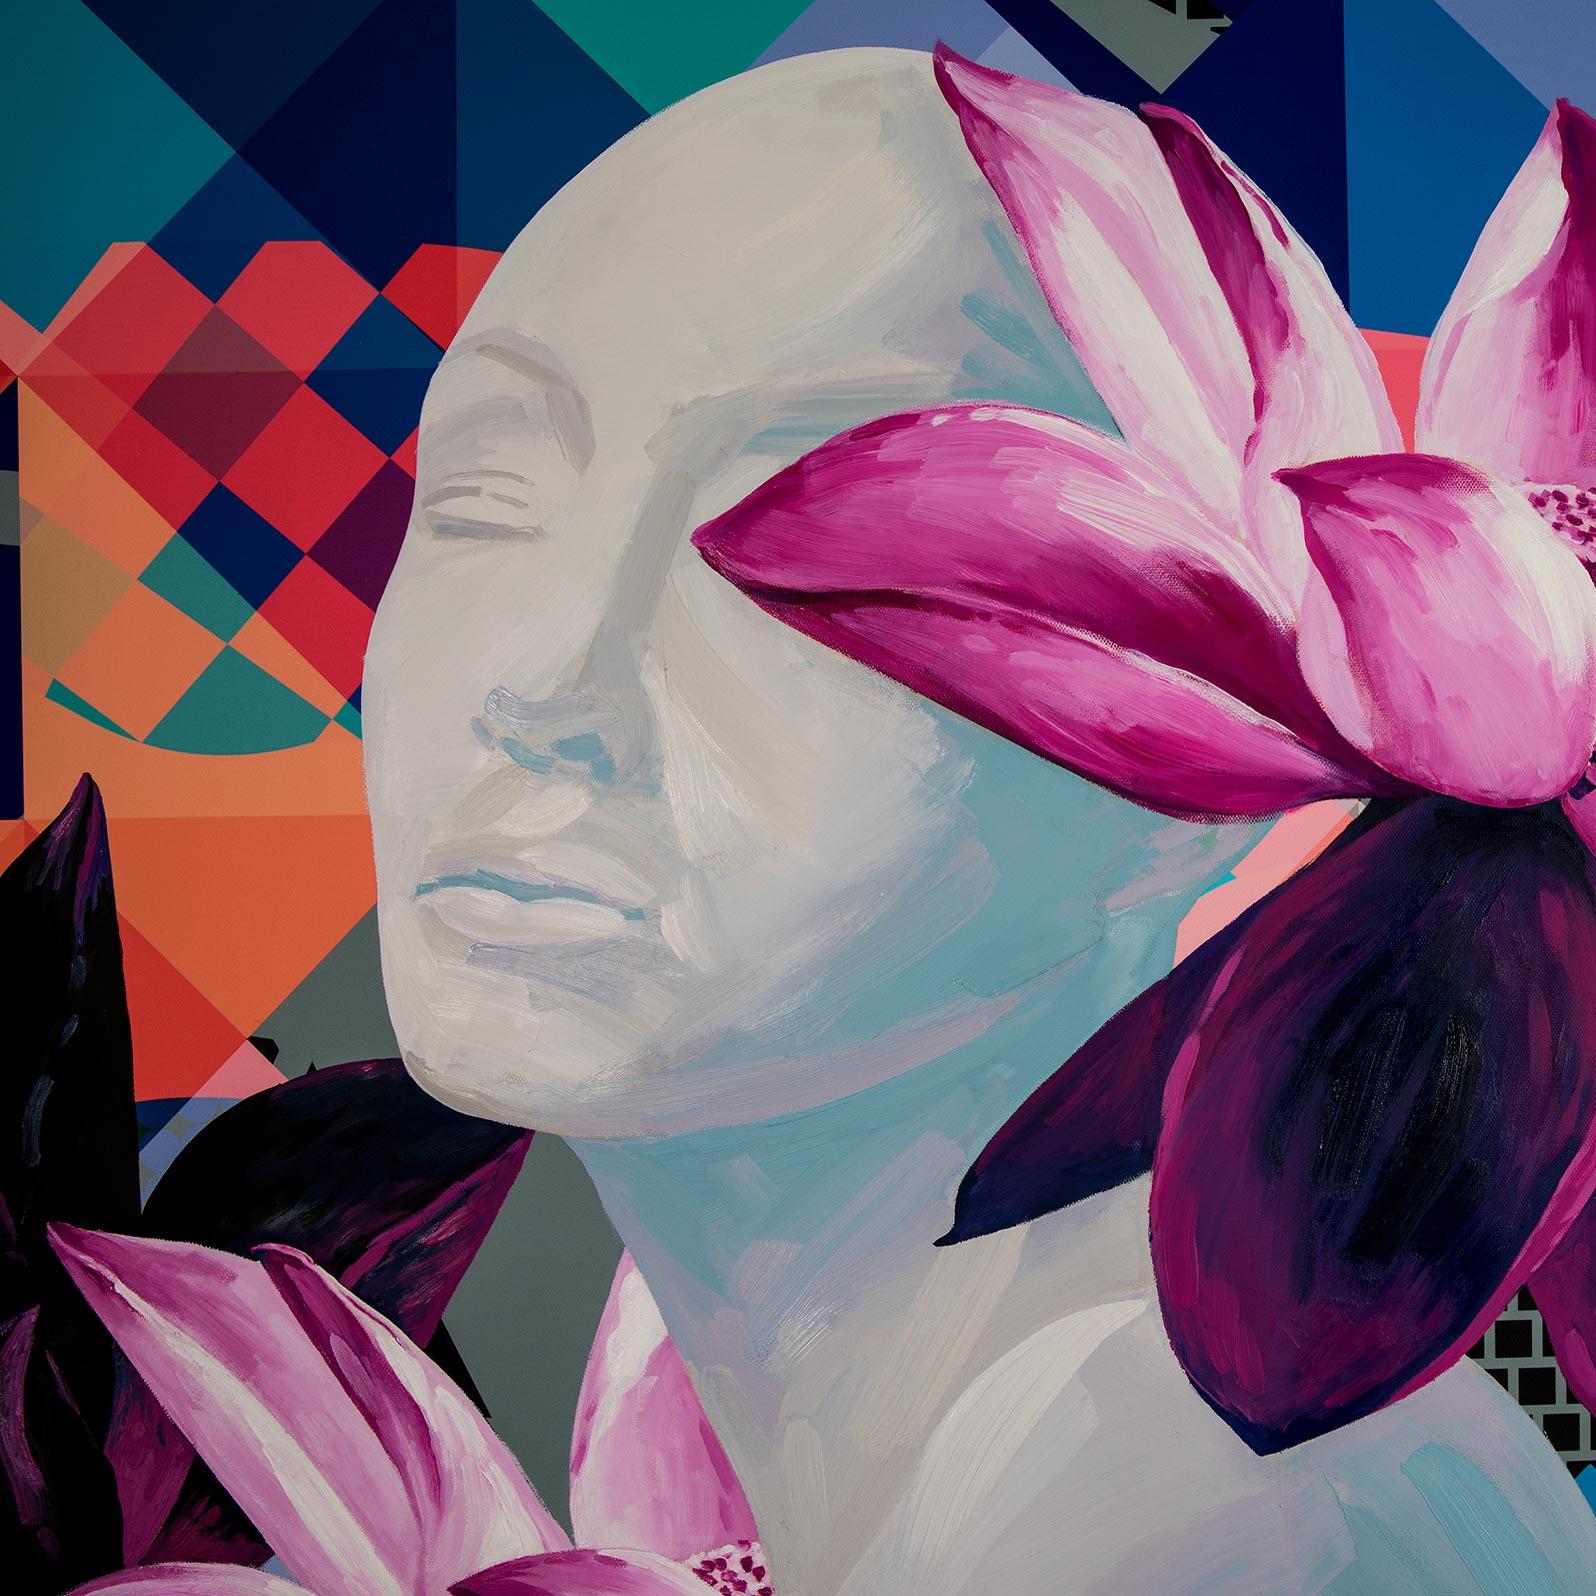 Anca Stefanescu | Contemporary Creative Painter, LucidDreaming